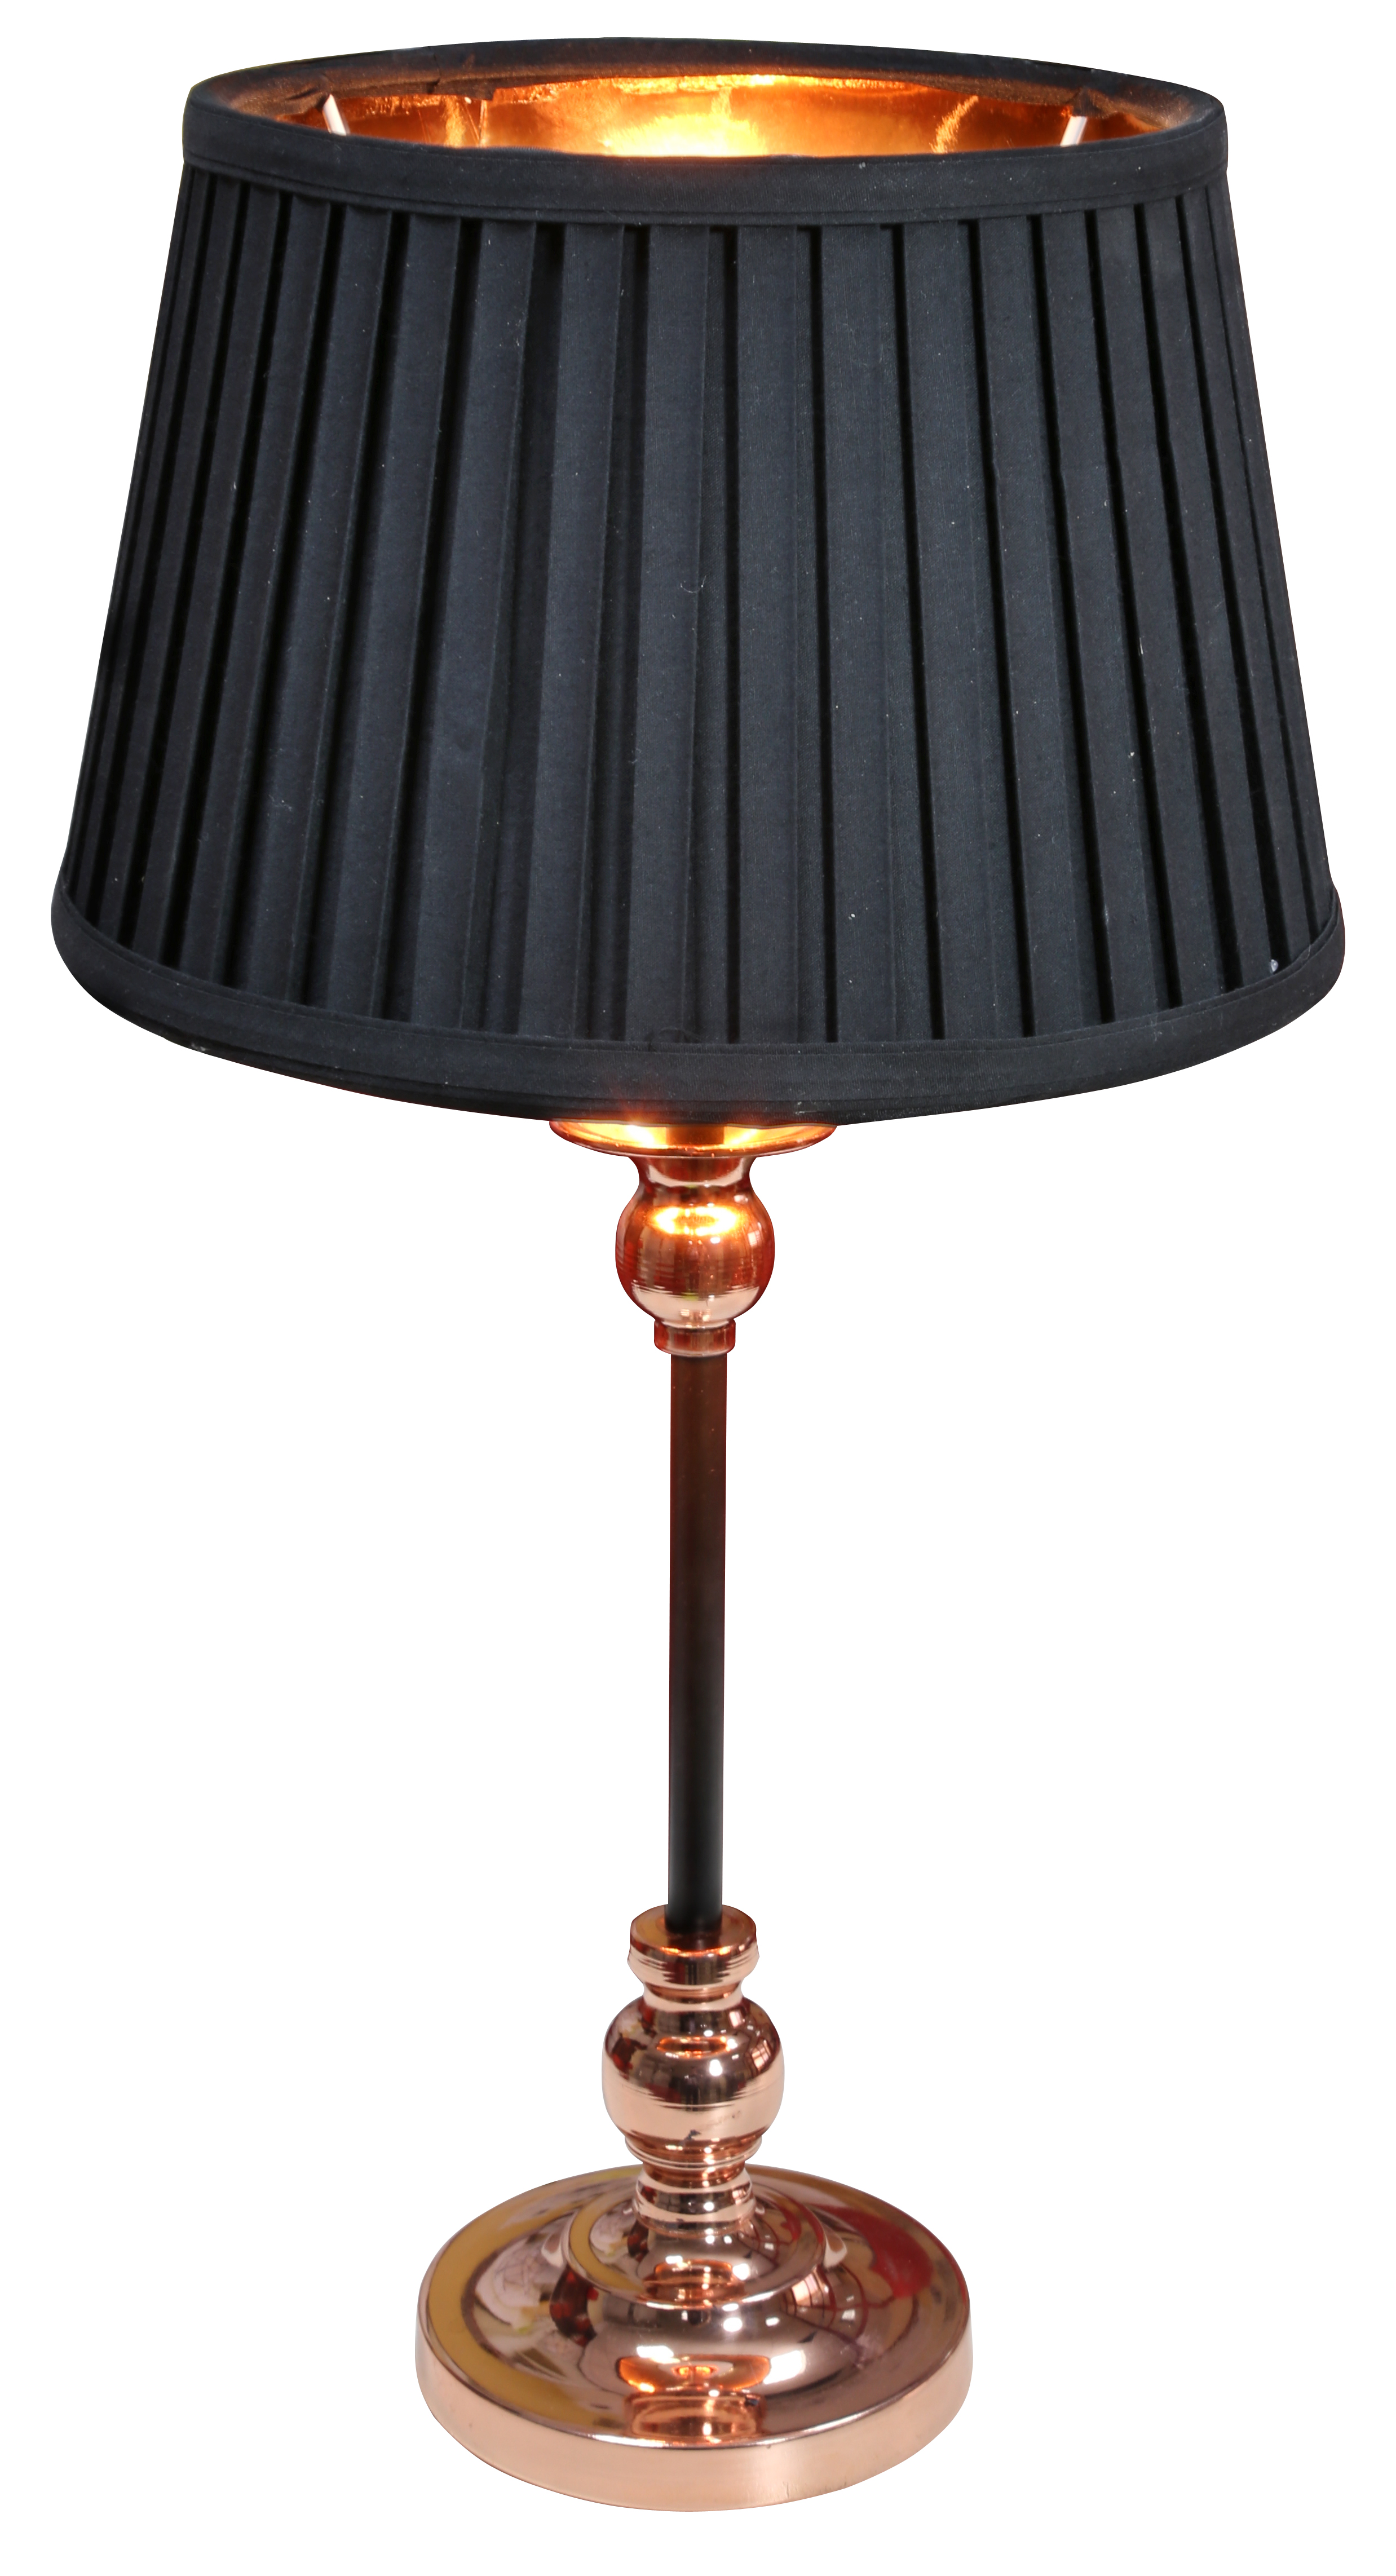 AMORE LAMPA GABINETOWA 1X60W E27 STOŻEK CZARNY - 41-38777